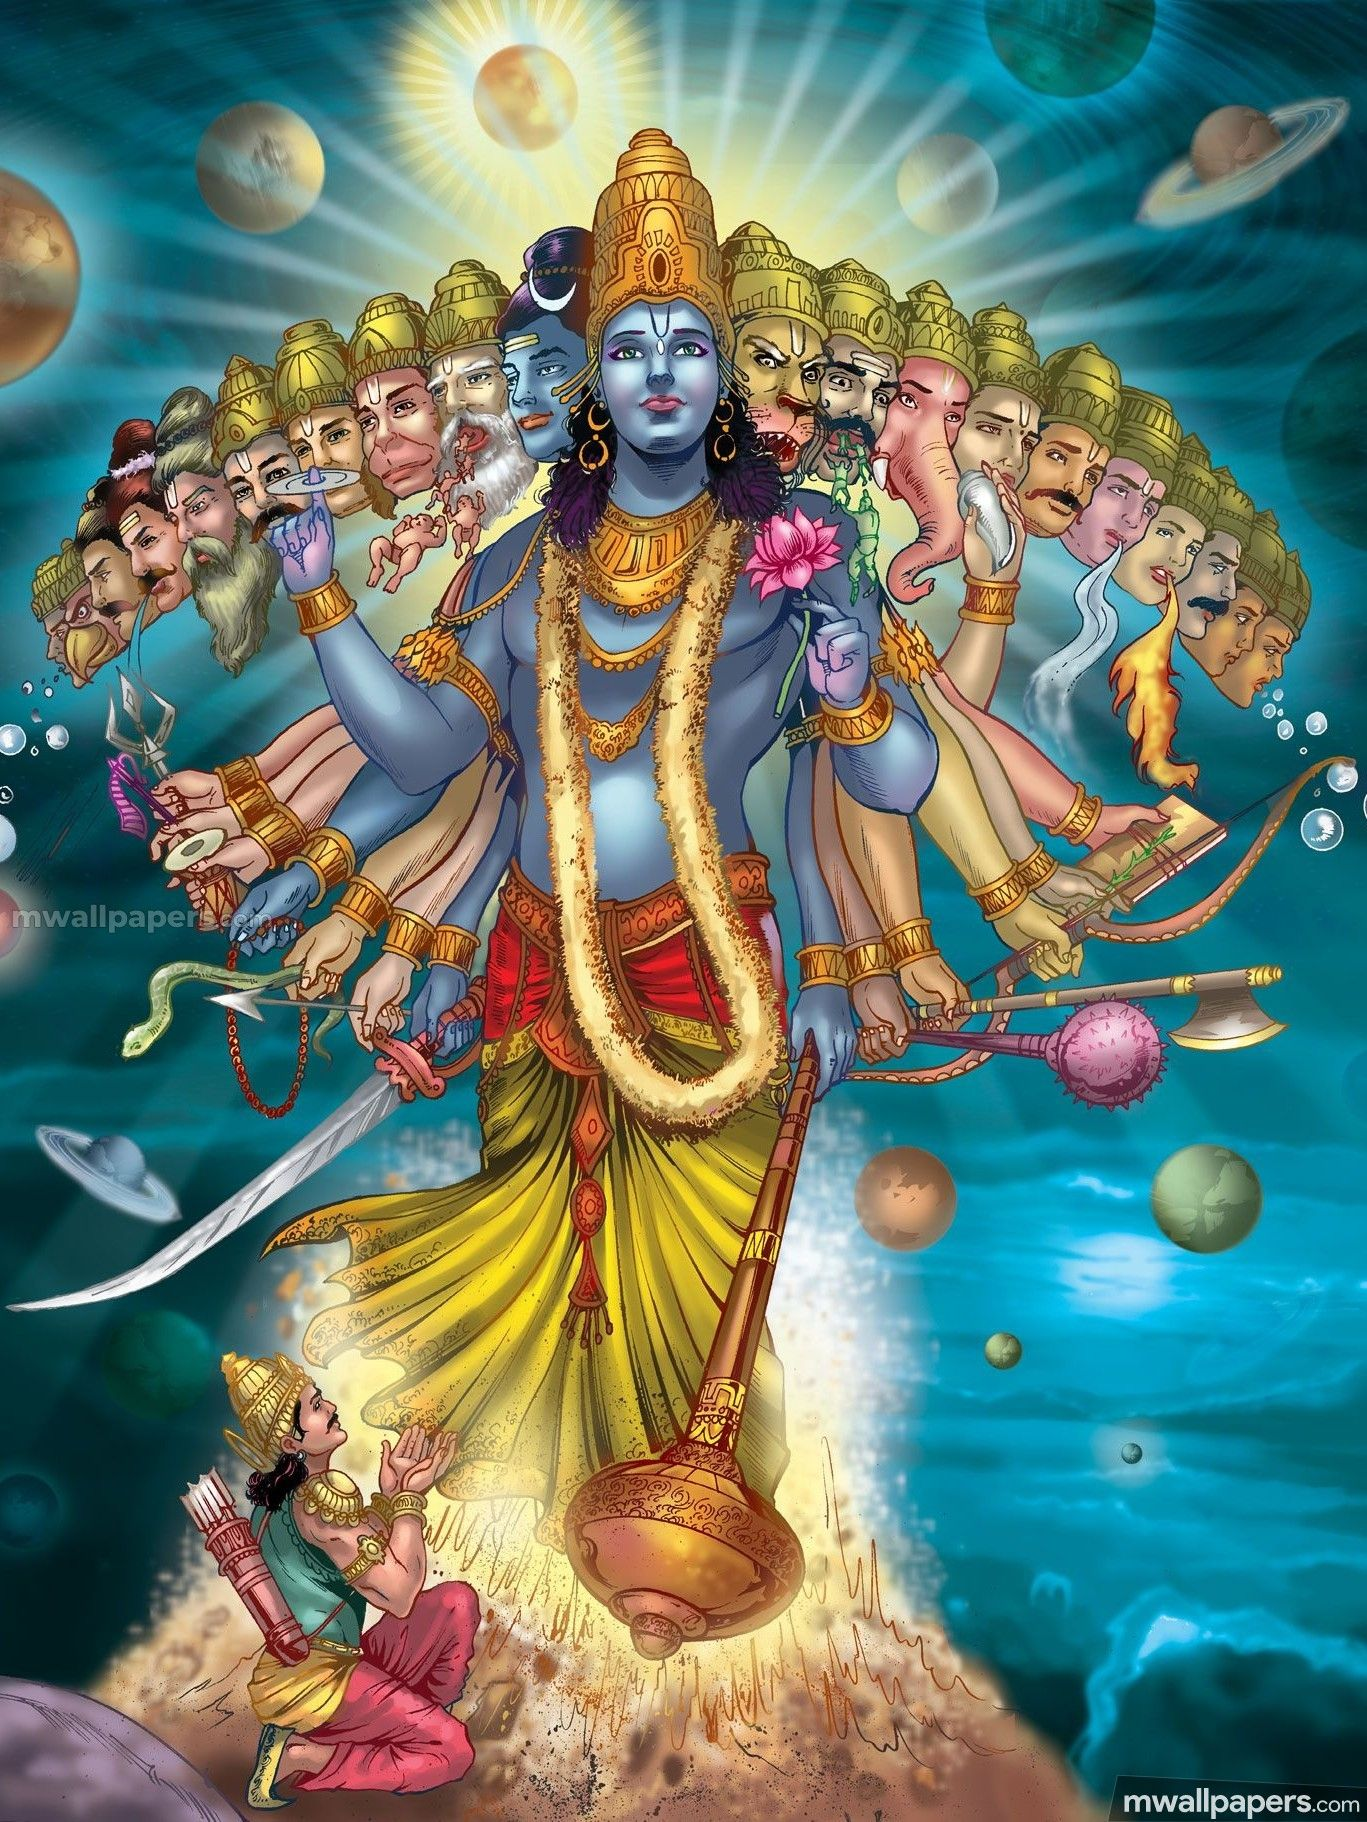 Lord Vishnu Hd Images 1080p 17185 Lordvishnu God Hindu Hdimages Hdwallpapers Lord Vishnu Wallpapers Lord Krishna Wallpapers Lord Krishna